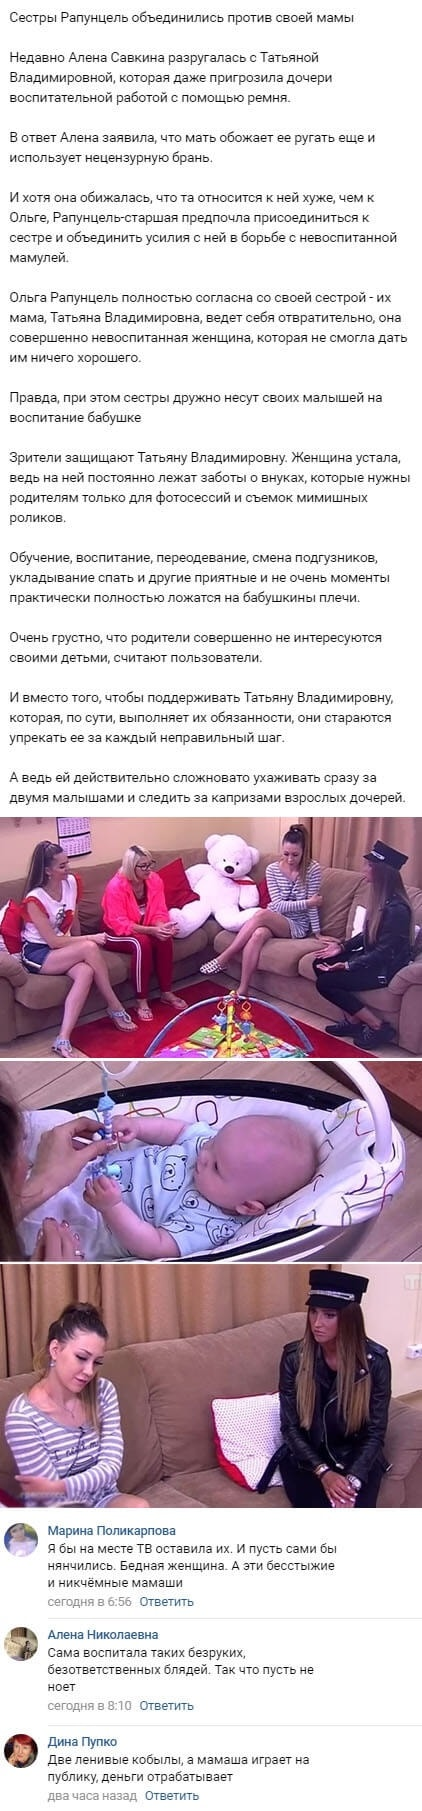 Алена Савкина и Ольга Рапунцель объединились перед общим врагом